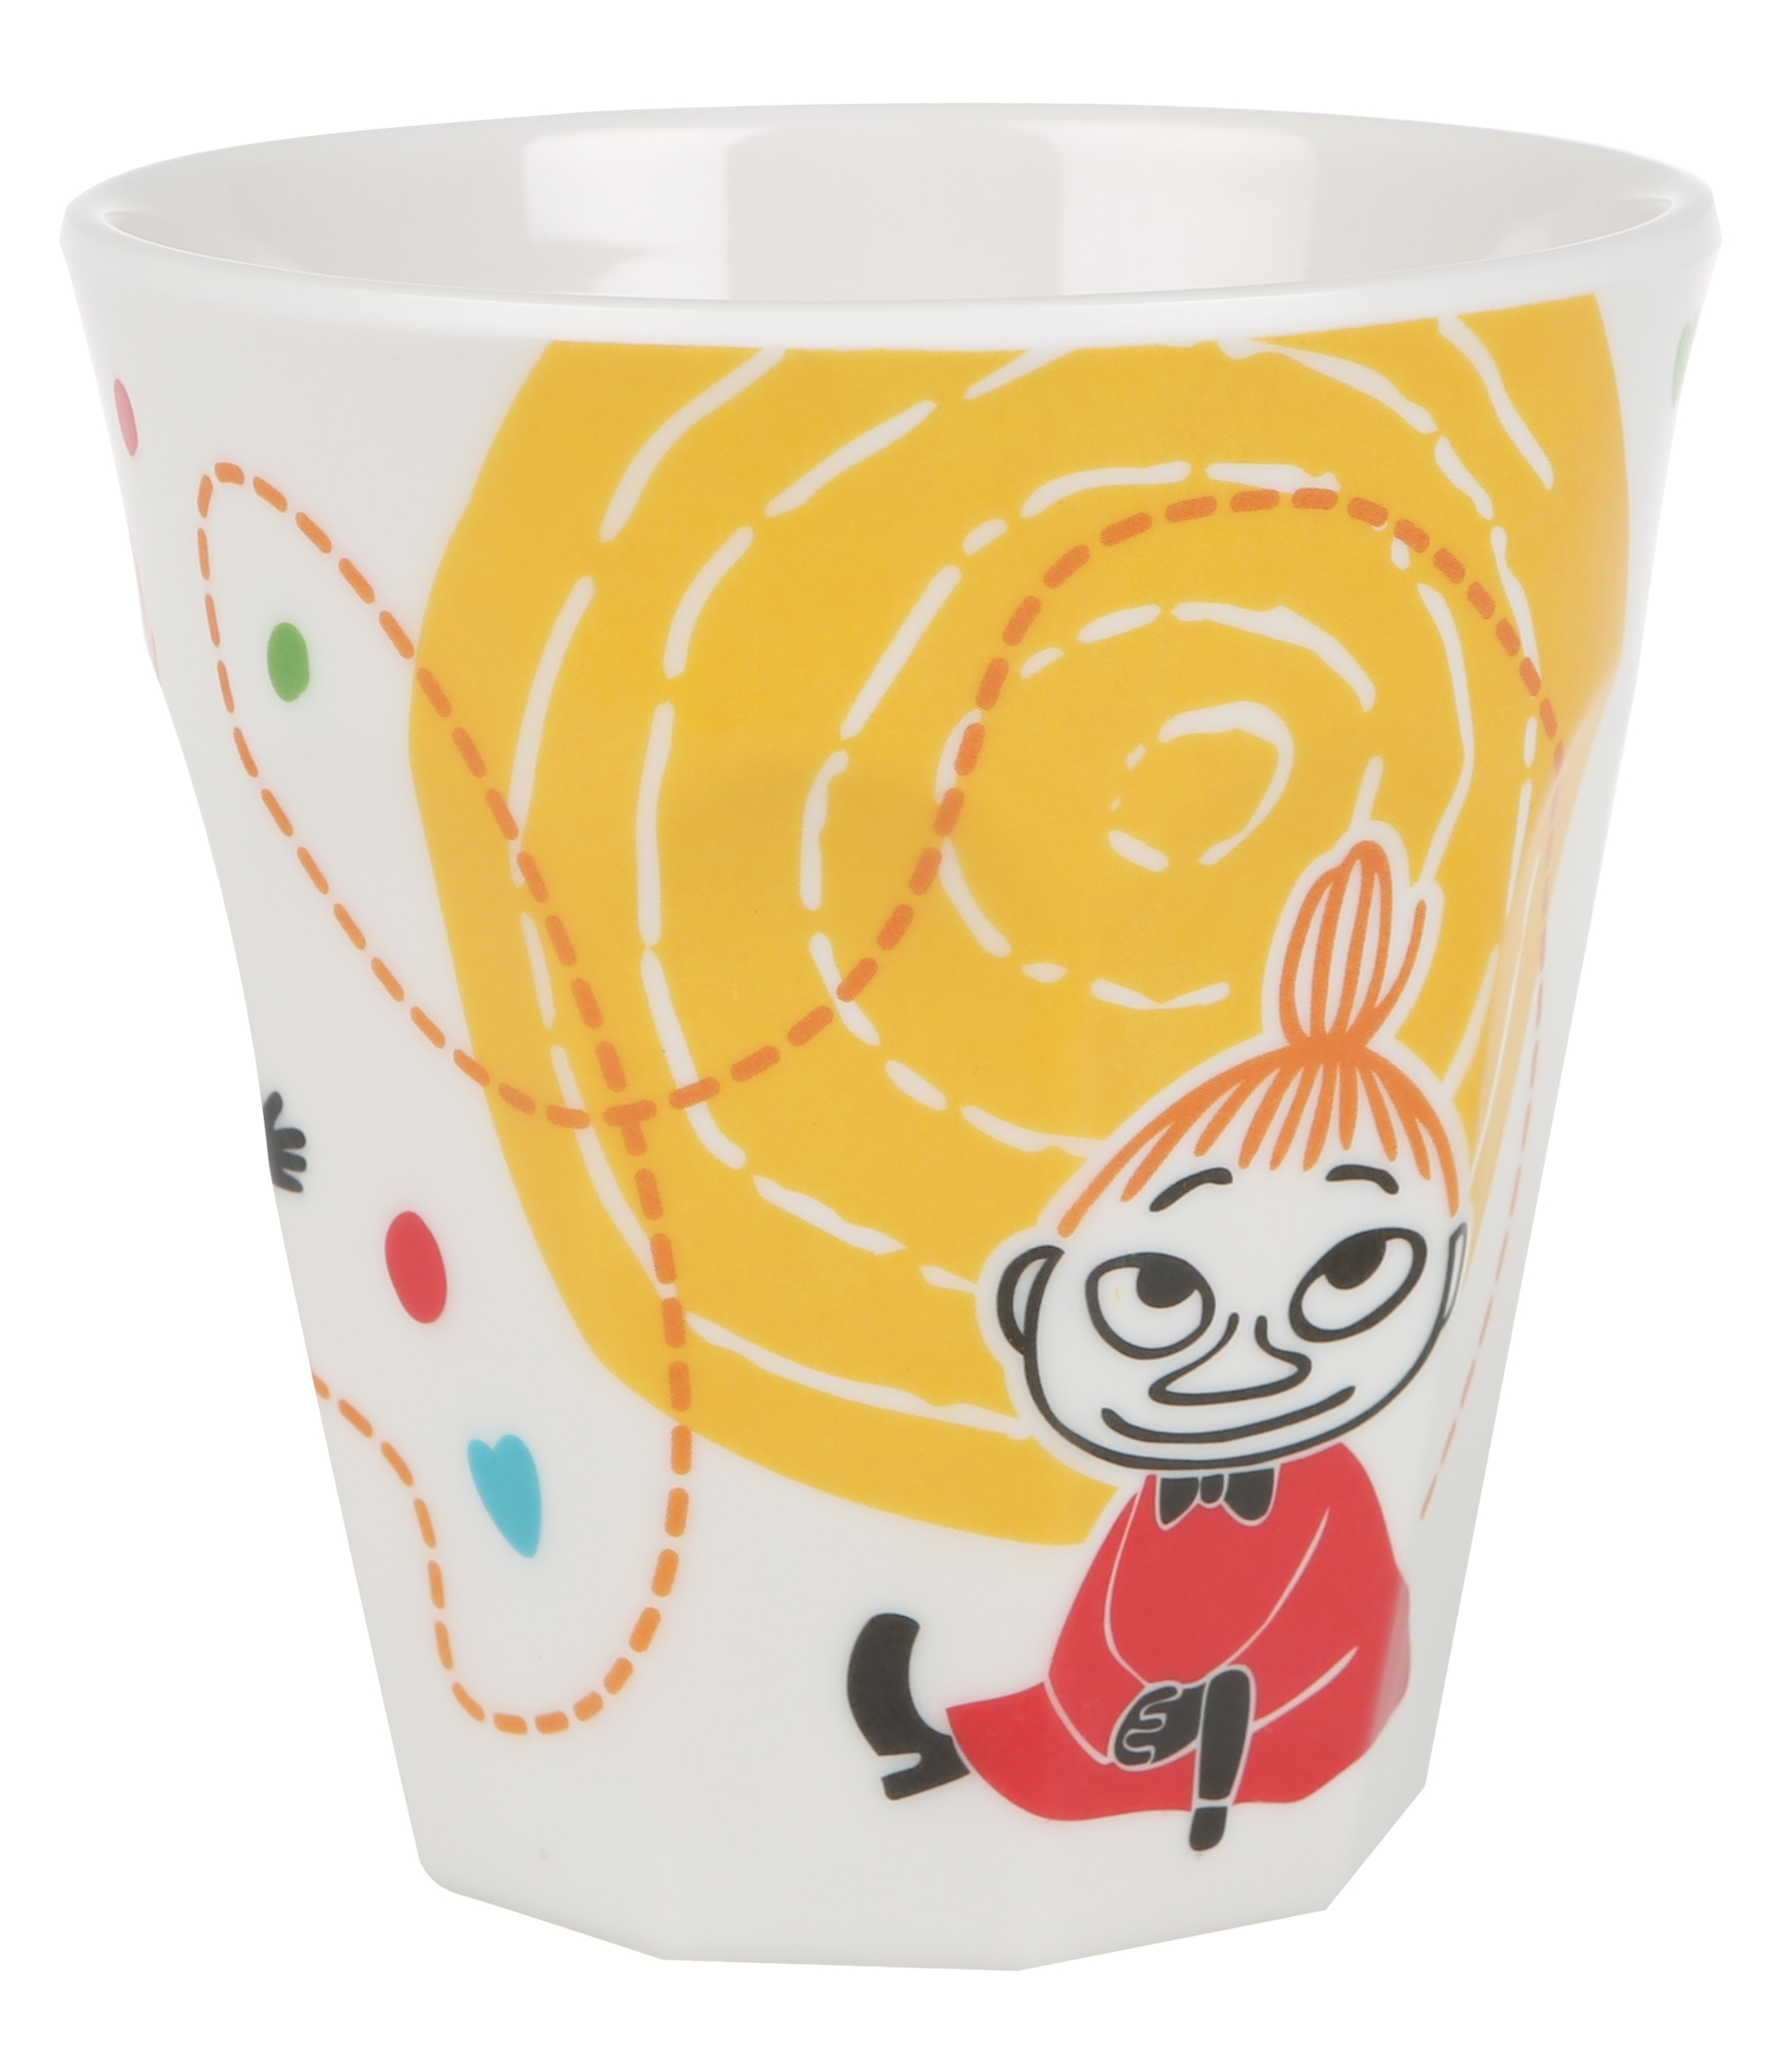 Martinex Little My Whirls melamine mug